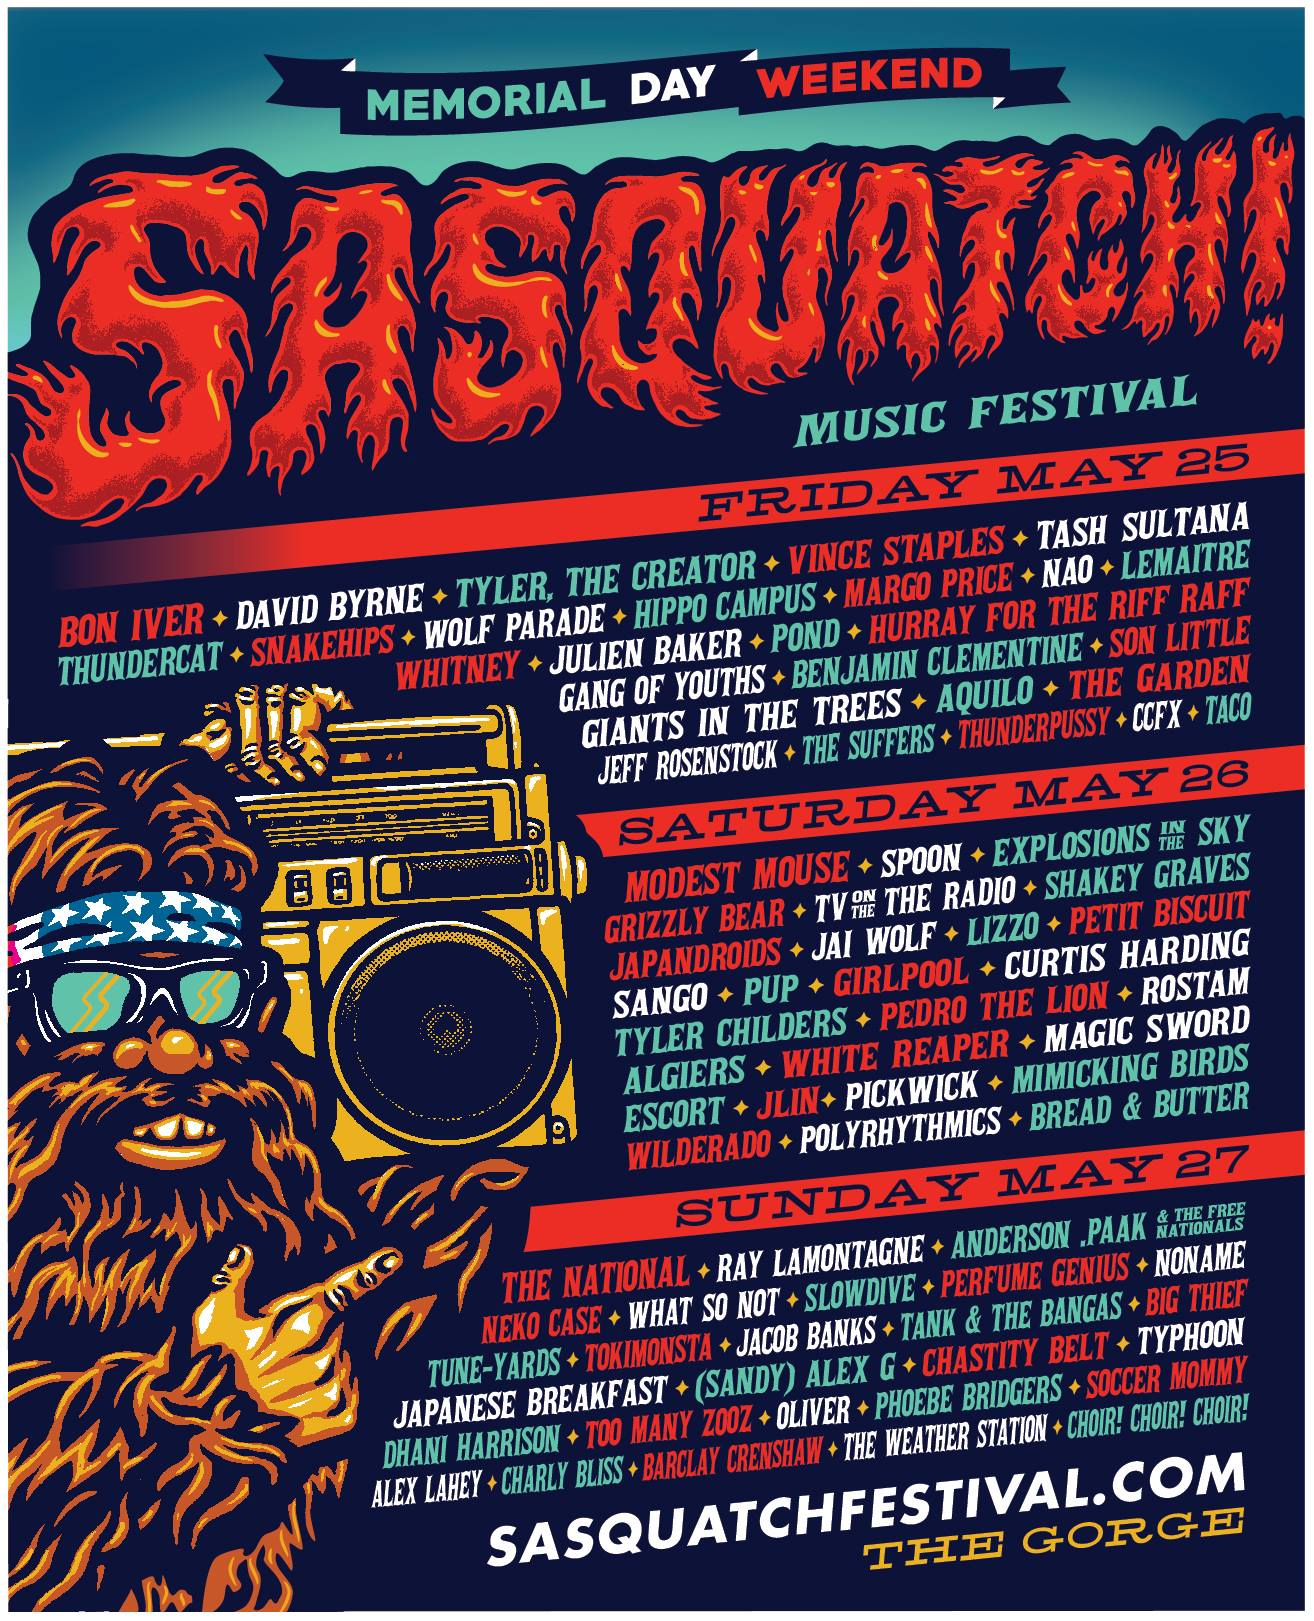 SasquatchMusicFest.jpg